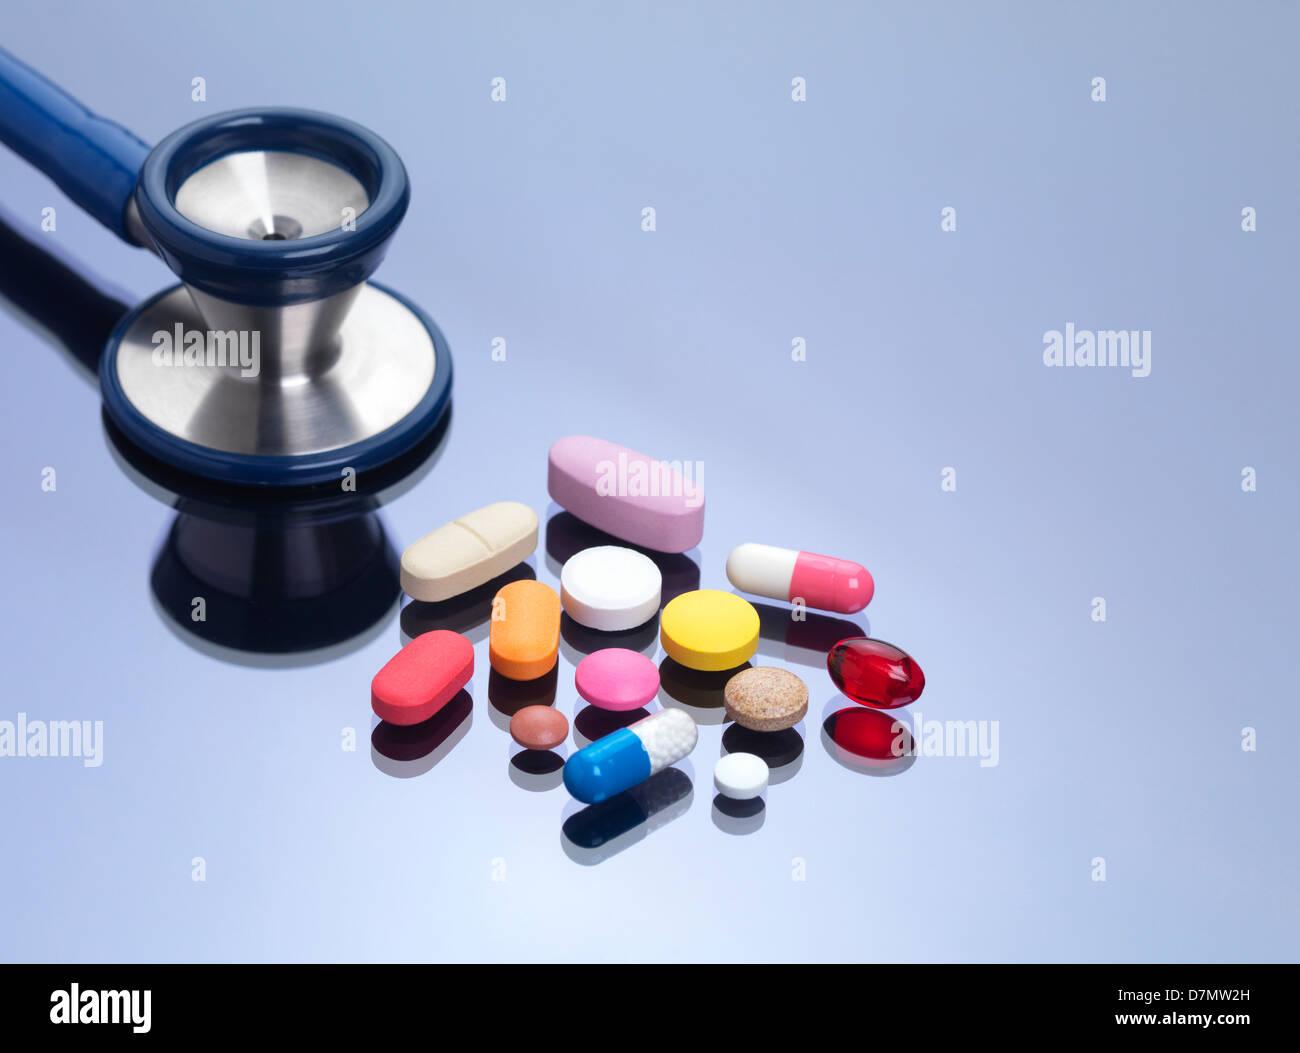 Healthcare, conceptual image - Stock Image